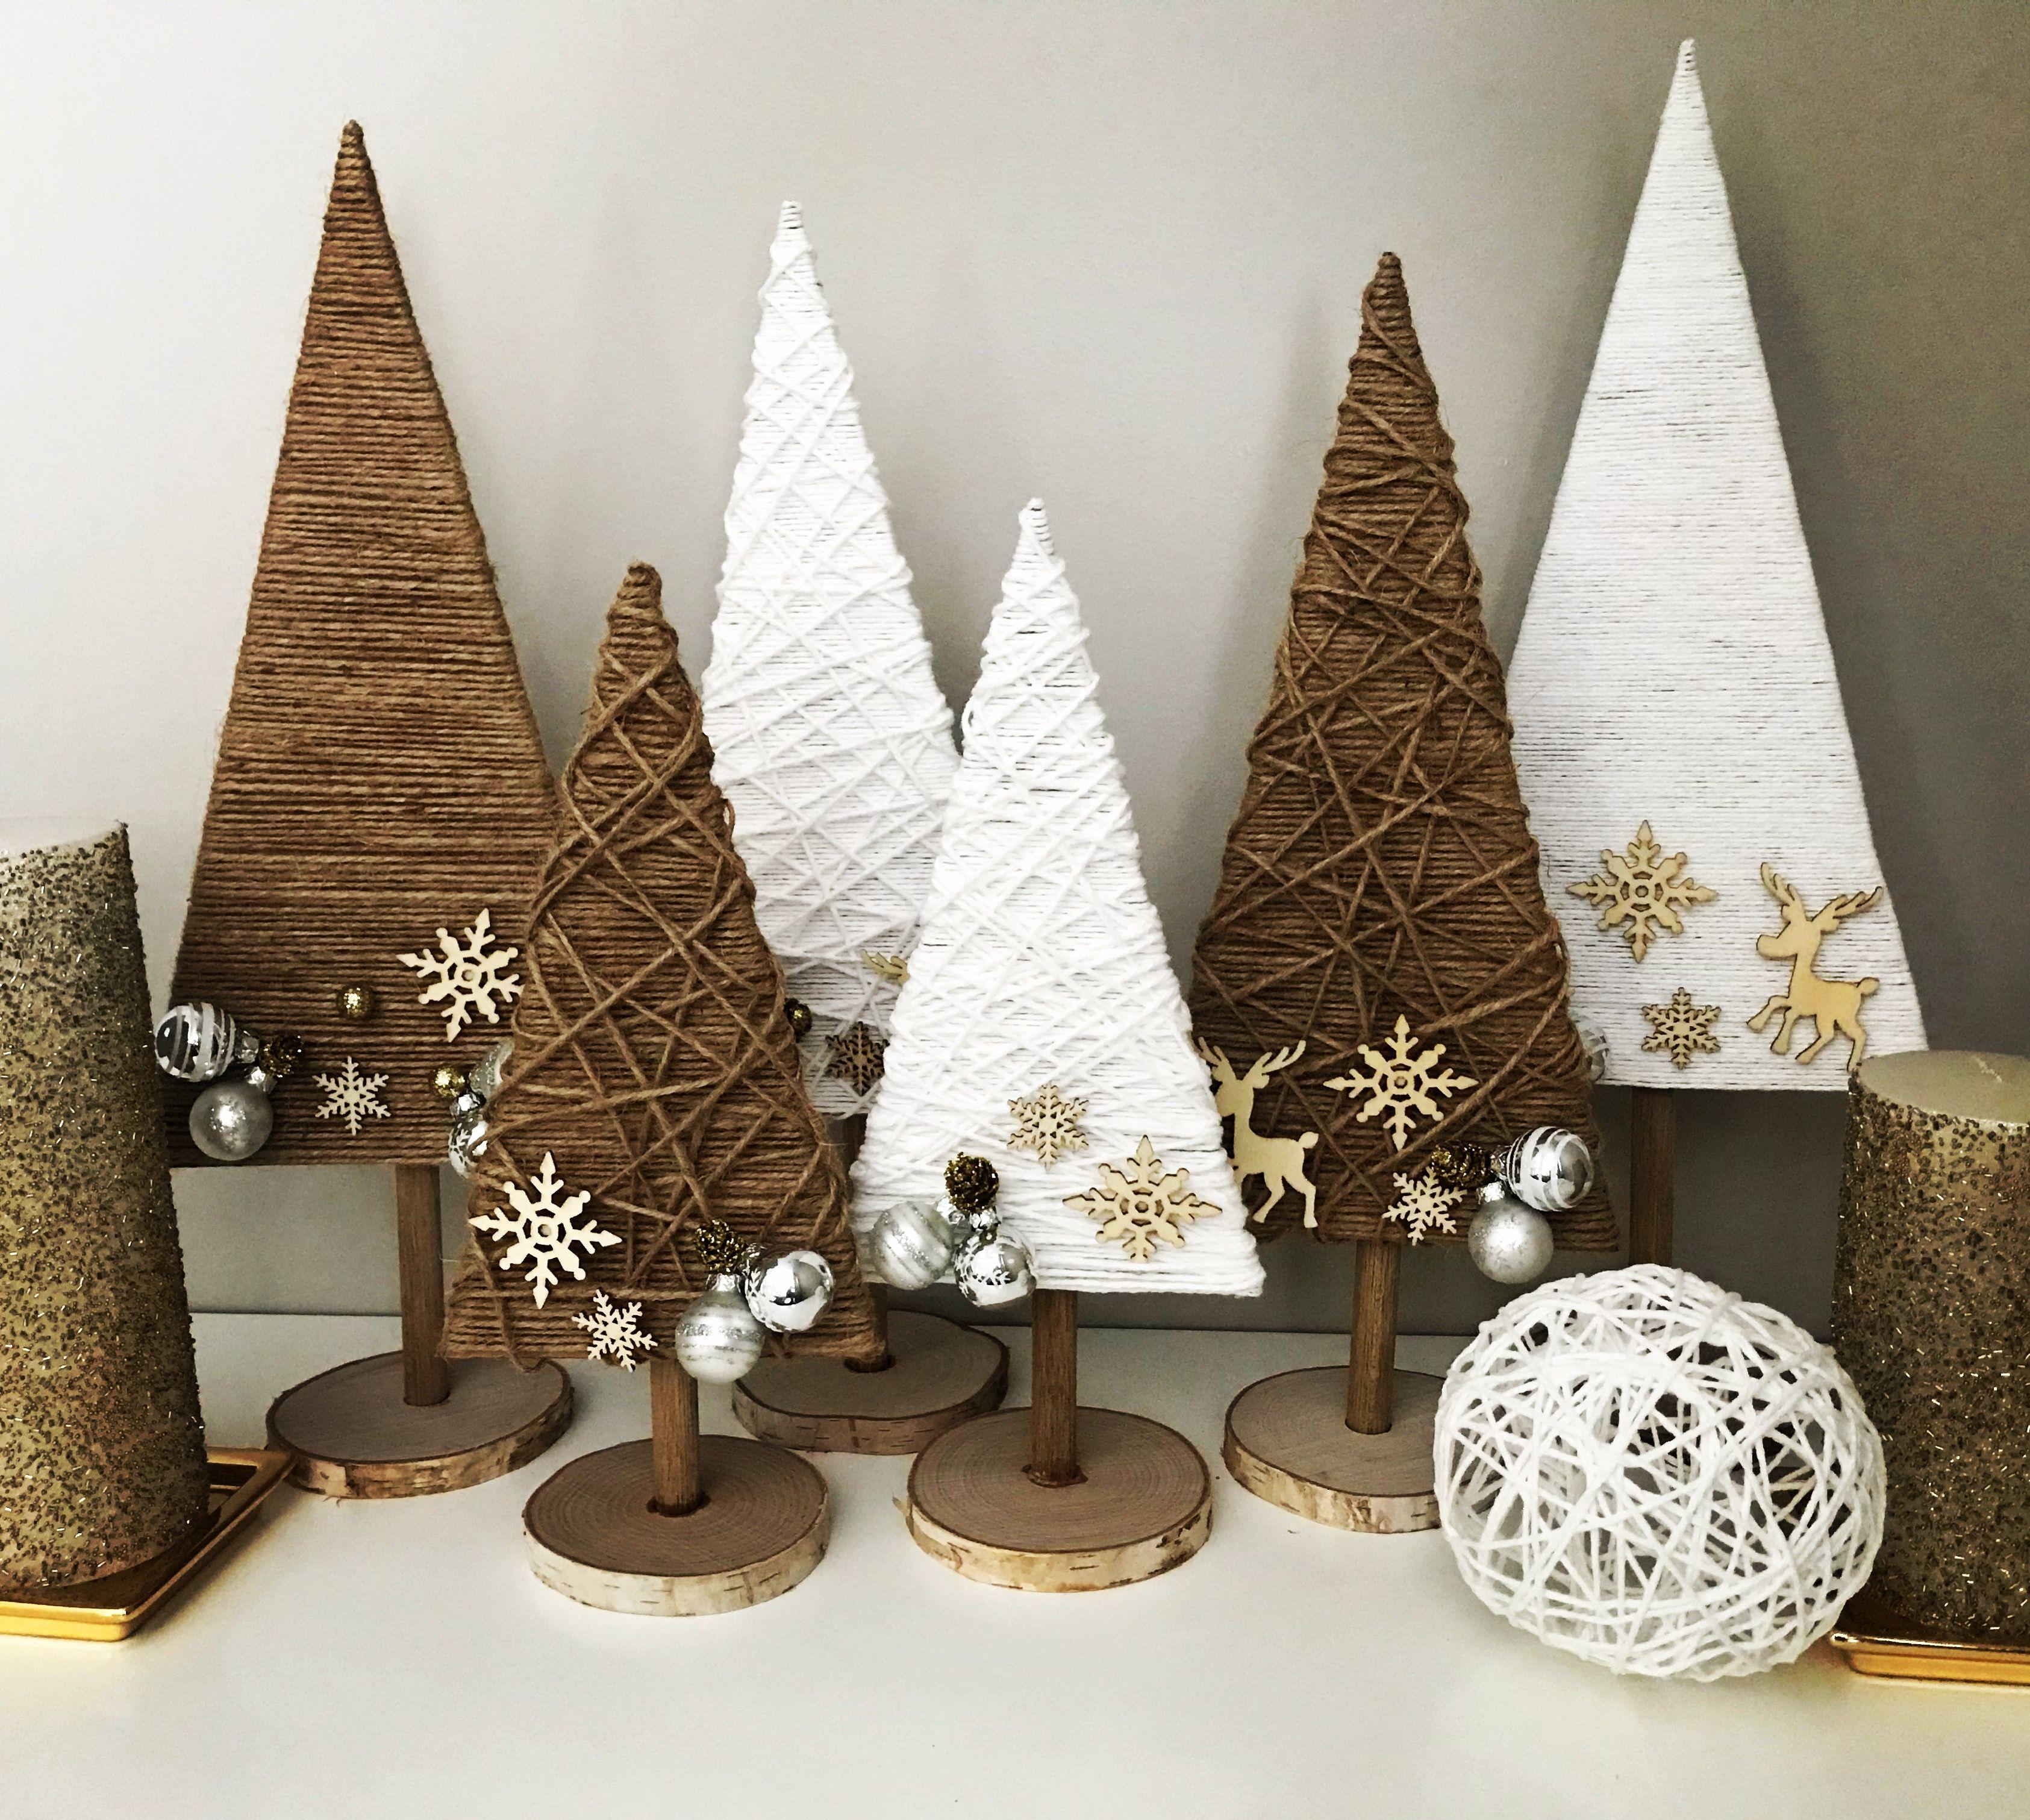 Handmade Christmas Tree I Love Them Handmade Christmas Tree Handmade Christmas Christmas Decor Diy